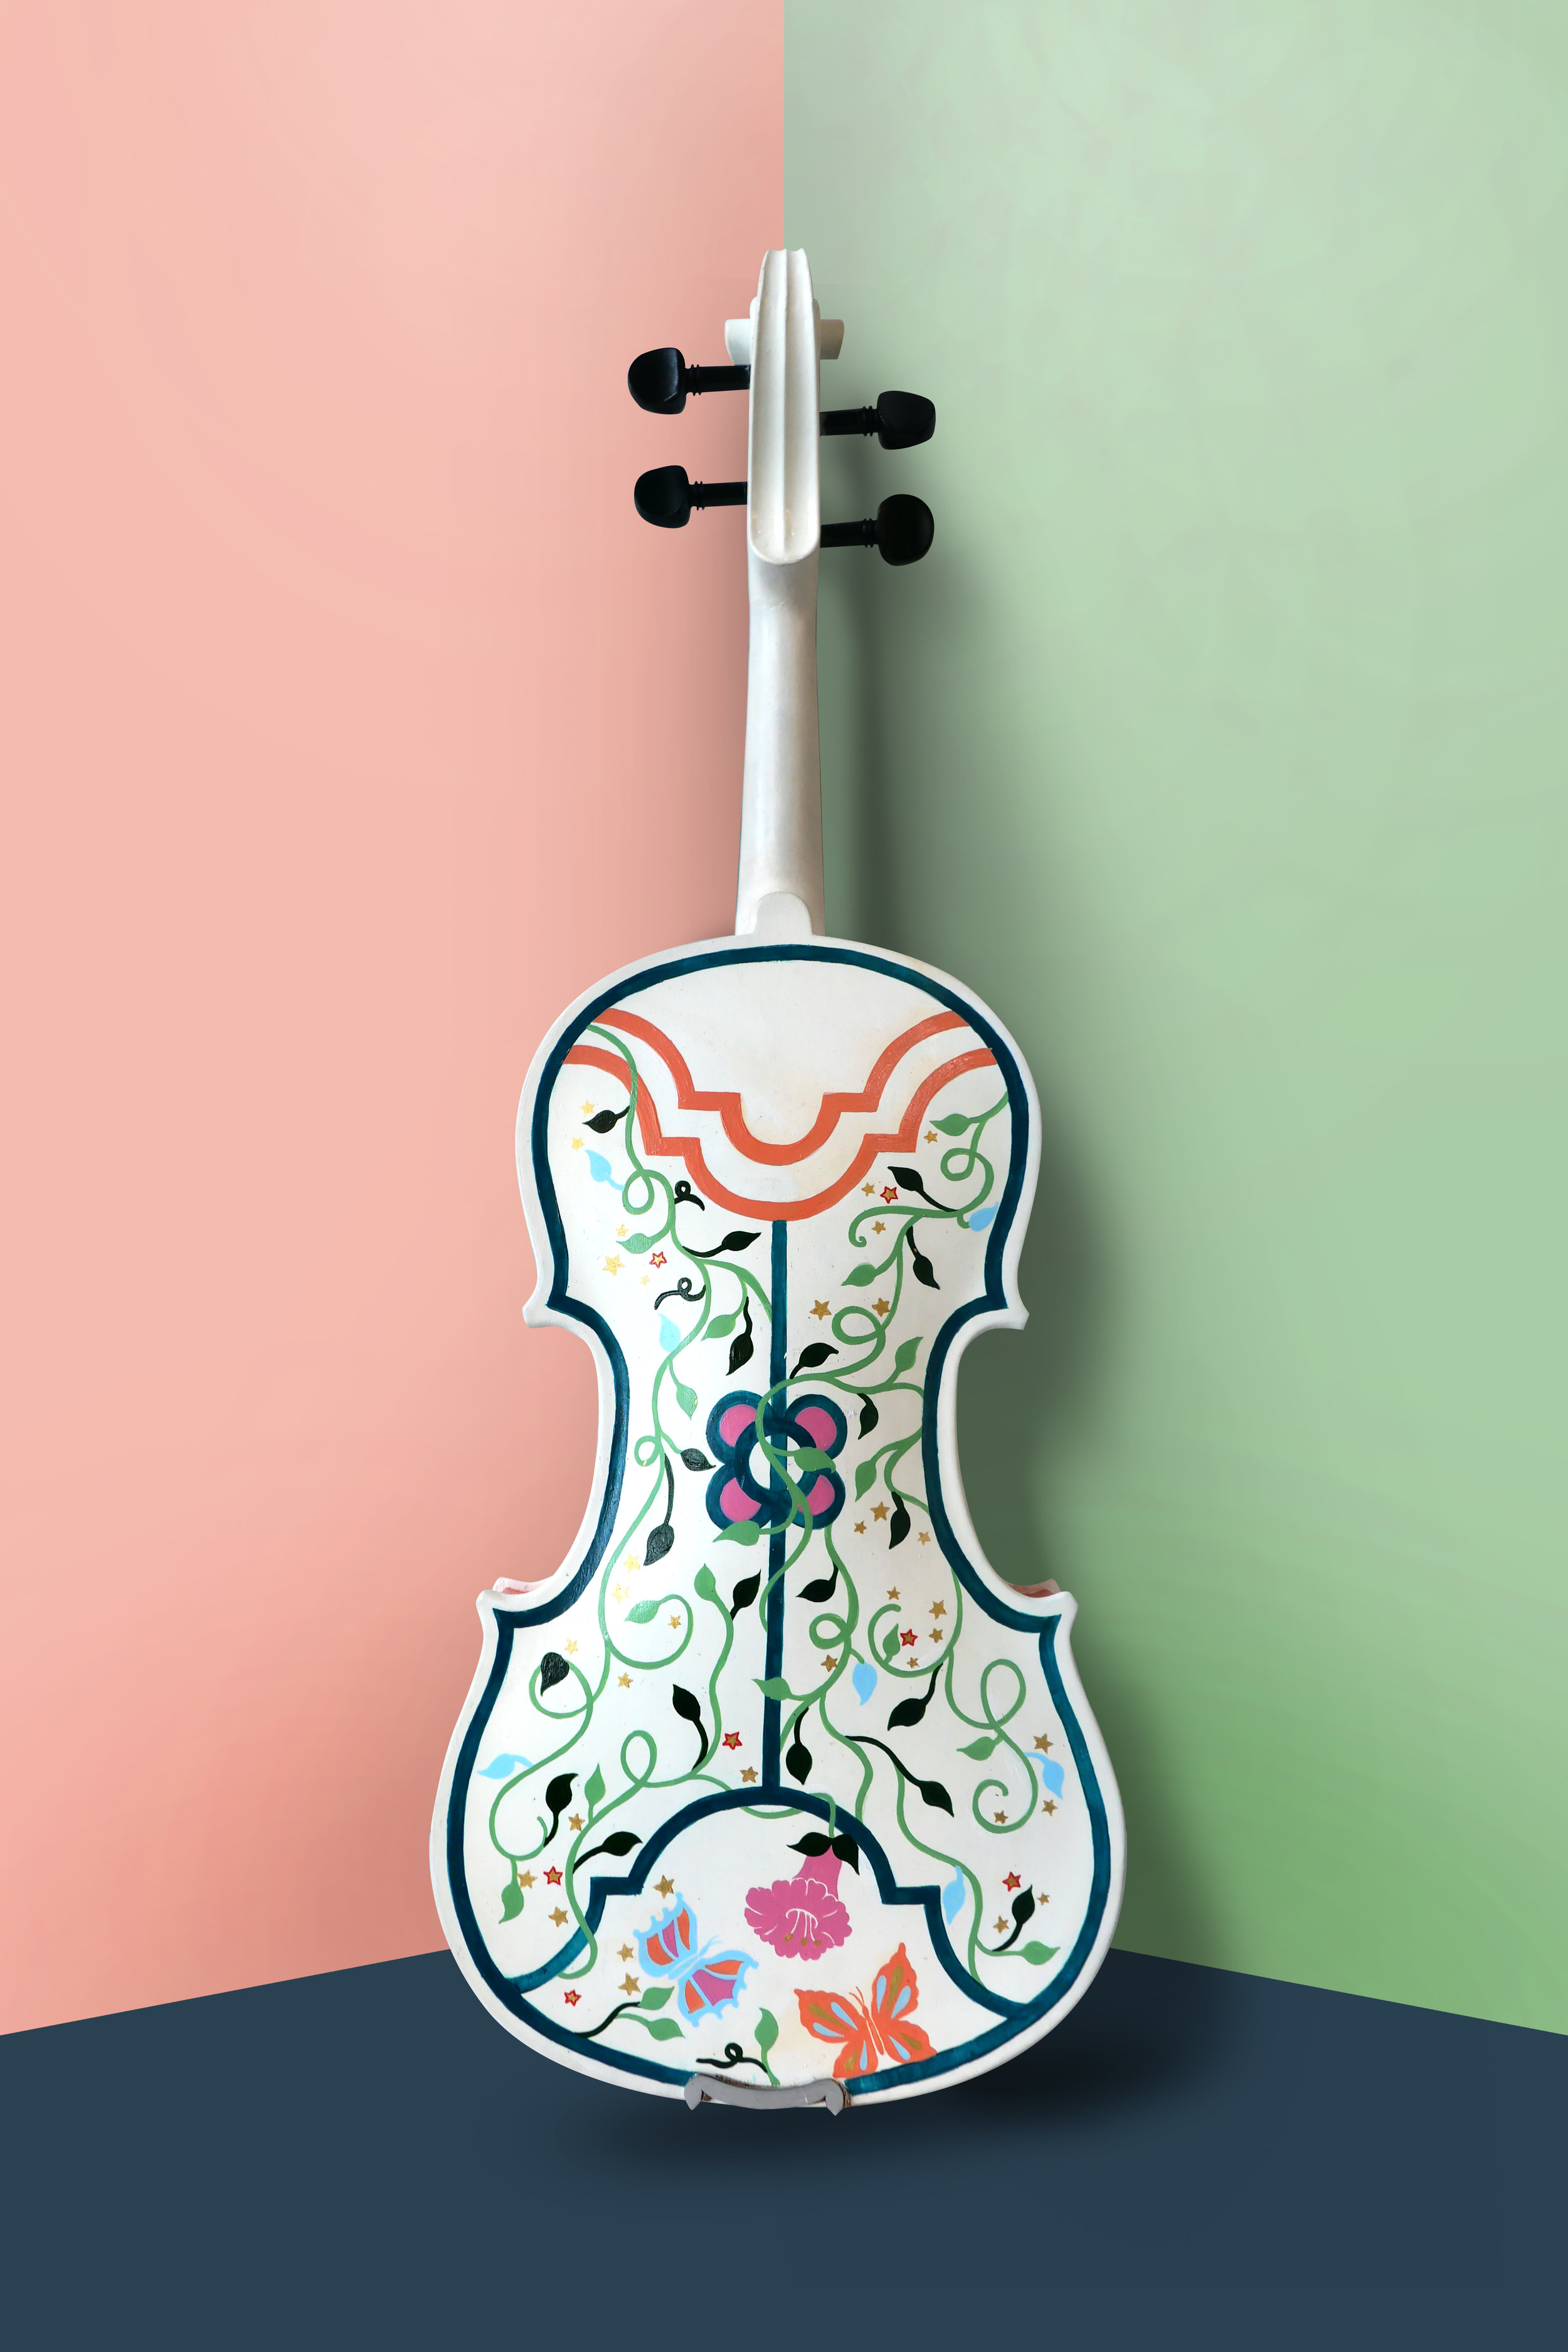 Pomme Chan-Aspire-Violin_2.jpg